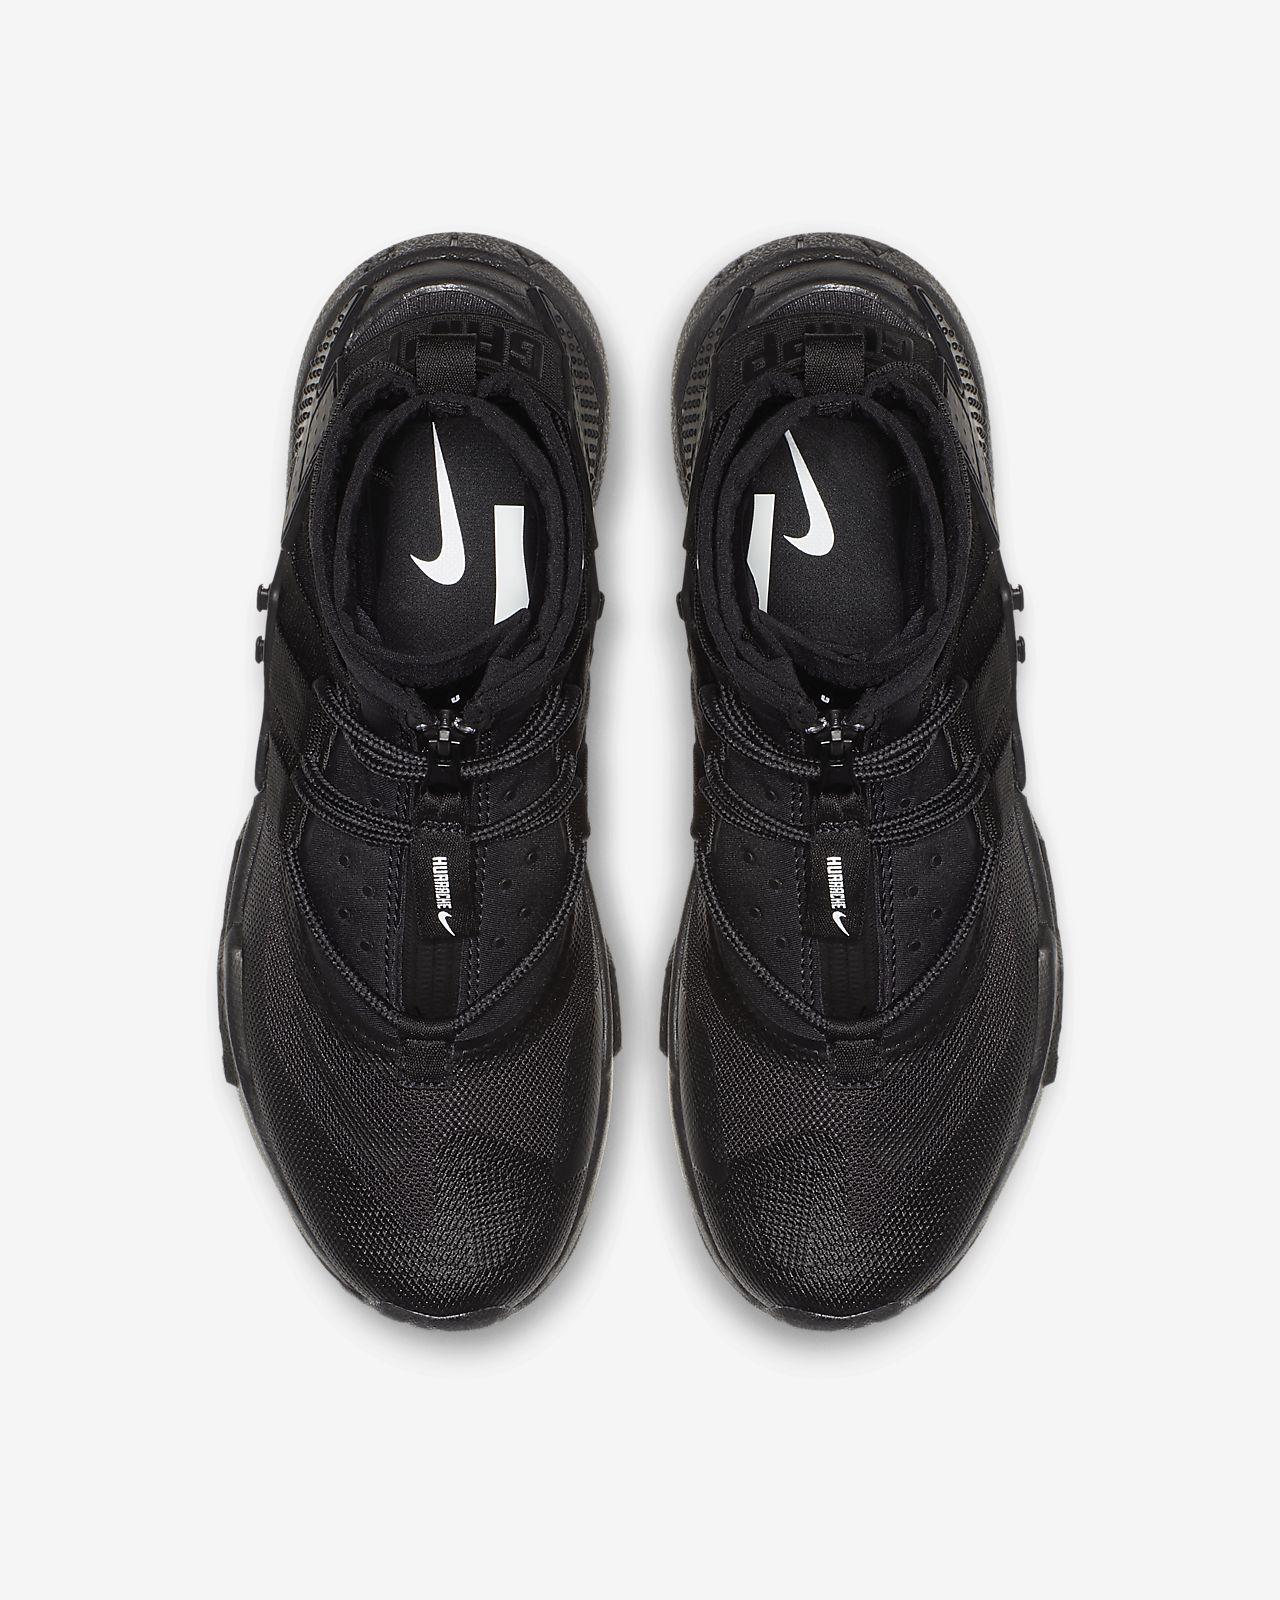 be03ee4f5bad Nike Air Huarache Gripp Men s Shoe. Nike.com